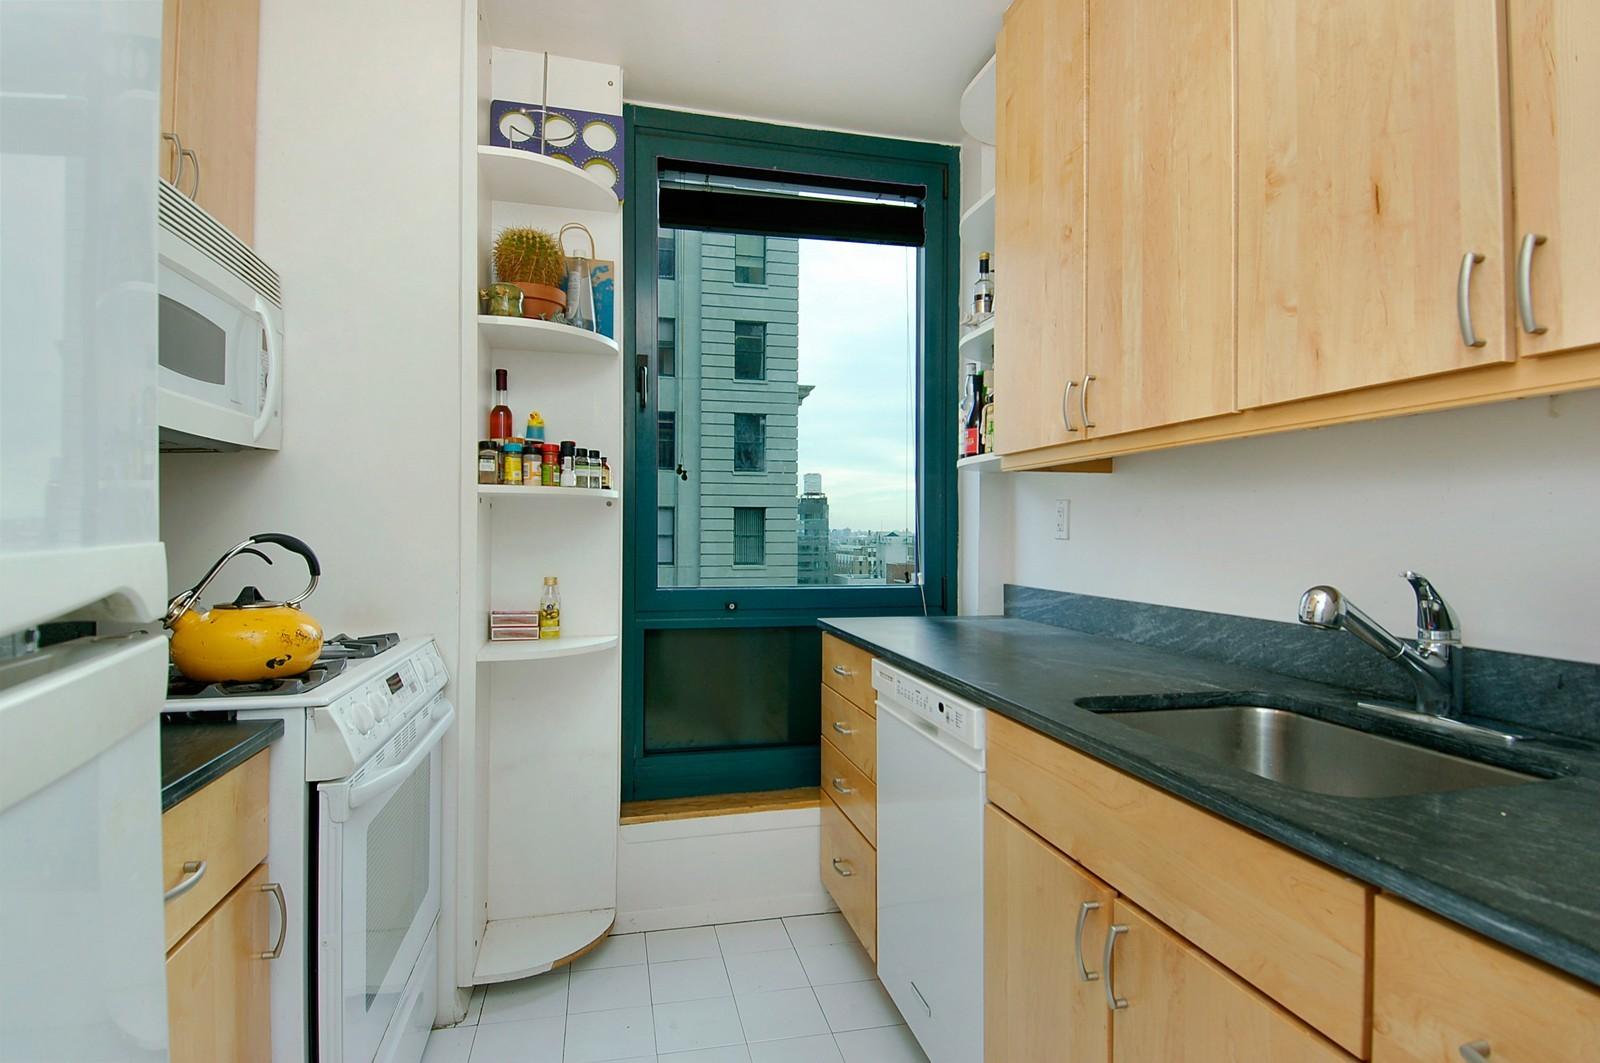 Corcoran, 1 IRVING PLACE, Apt. V20A, Gramercy Real Estate, Manhattan ...